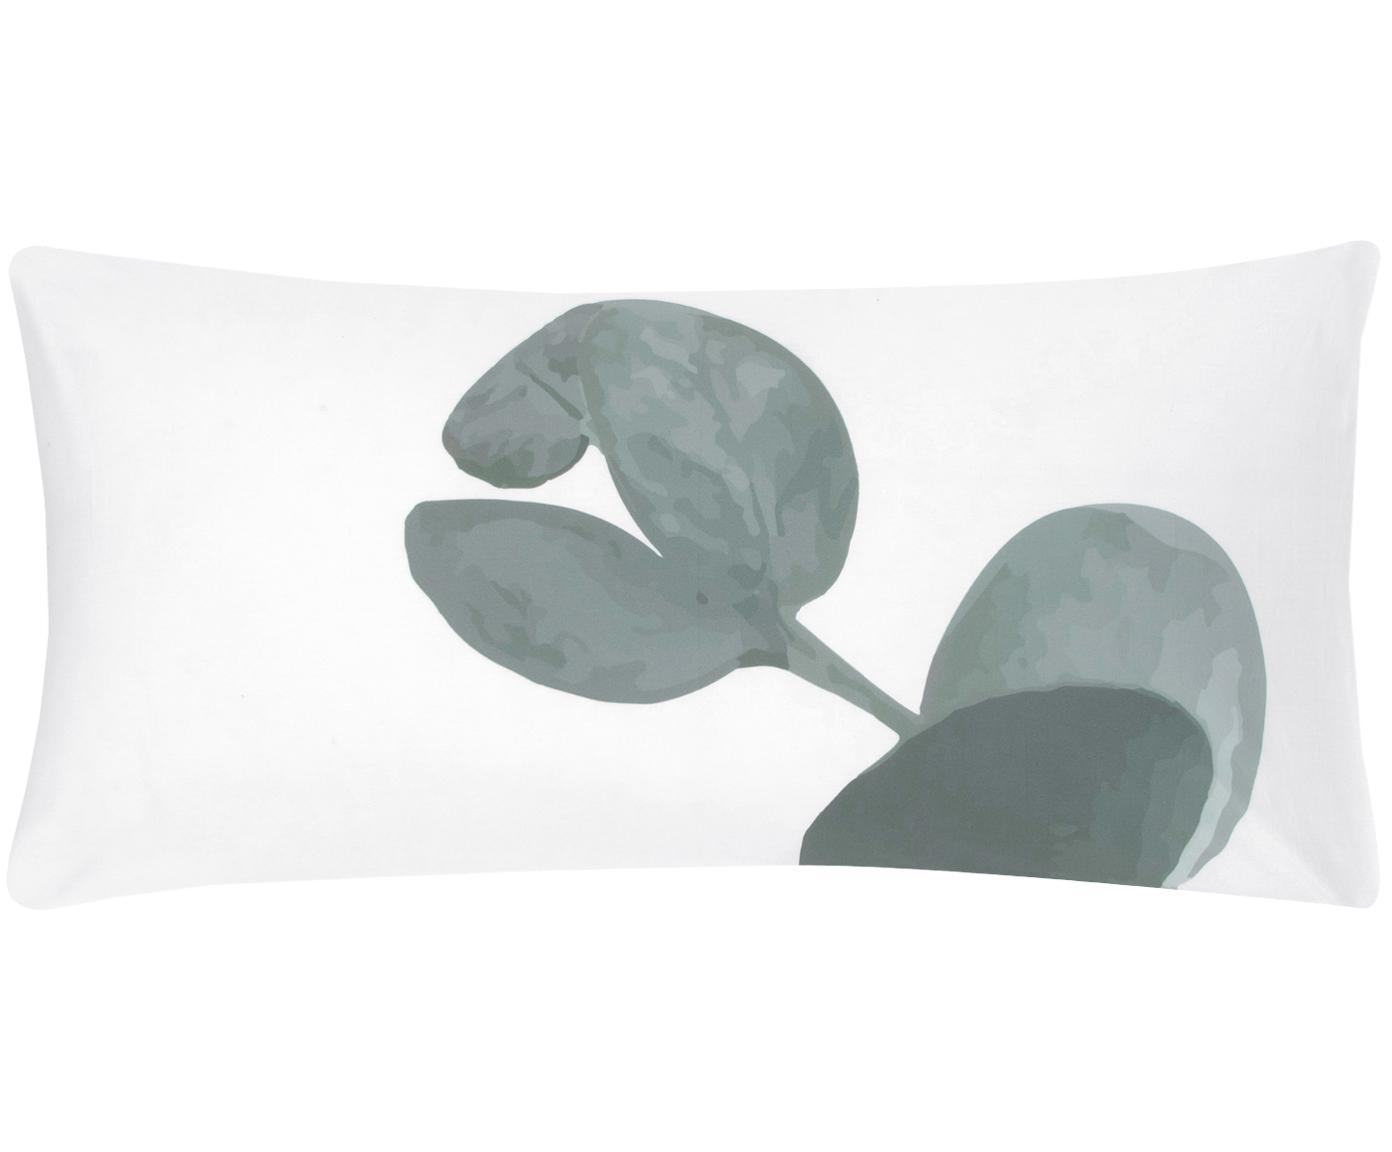 Baumwollperkal-Kissenbezüge Eukalyptus mit Blattmotiv, 2 Stück, Webart: Perkal Fadendichte 180 TC, Grün, Cremeweiß, 40 x 80 cm